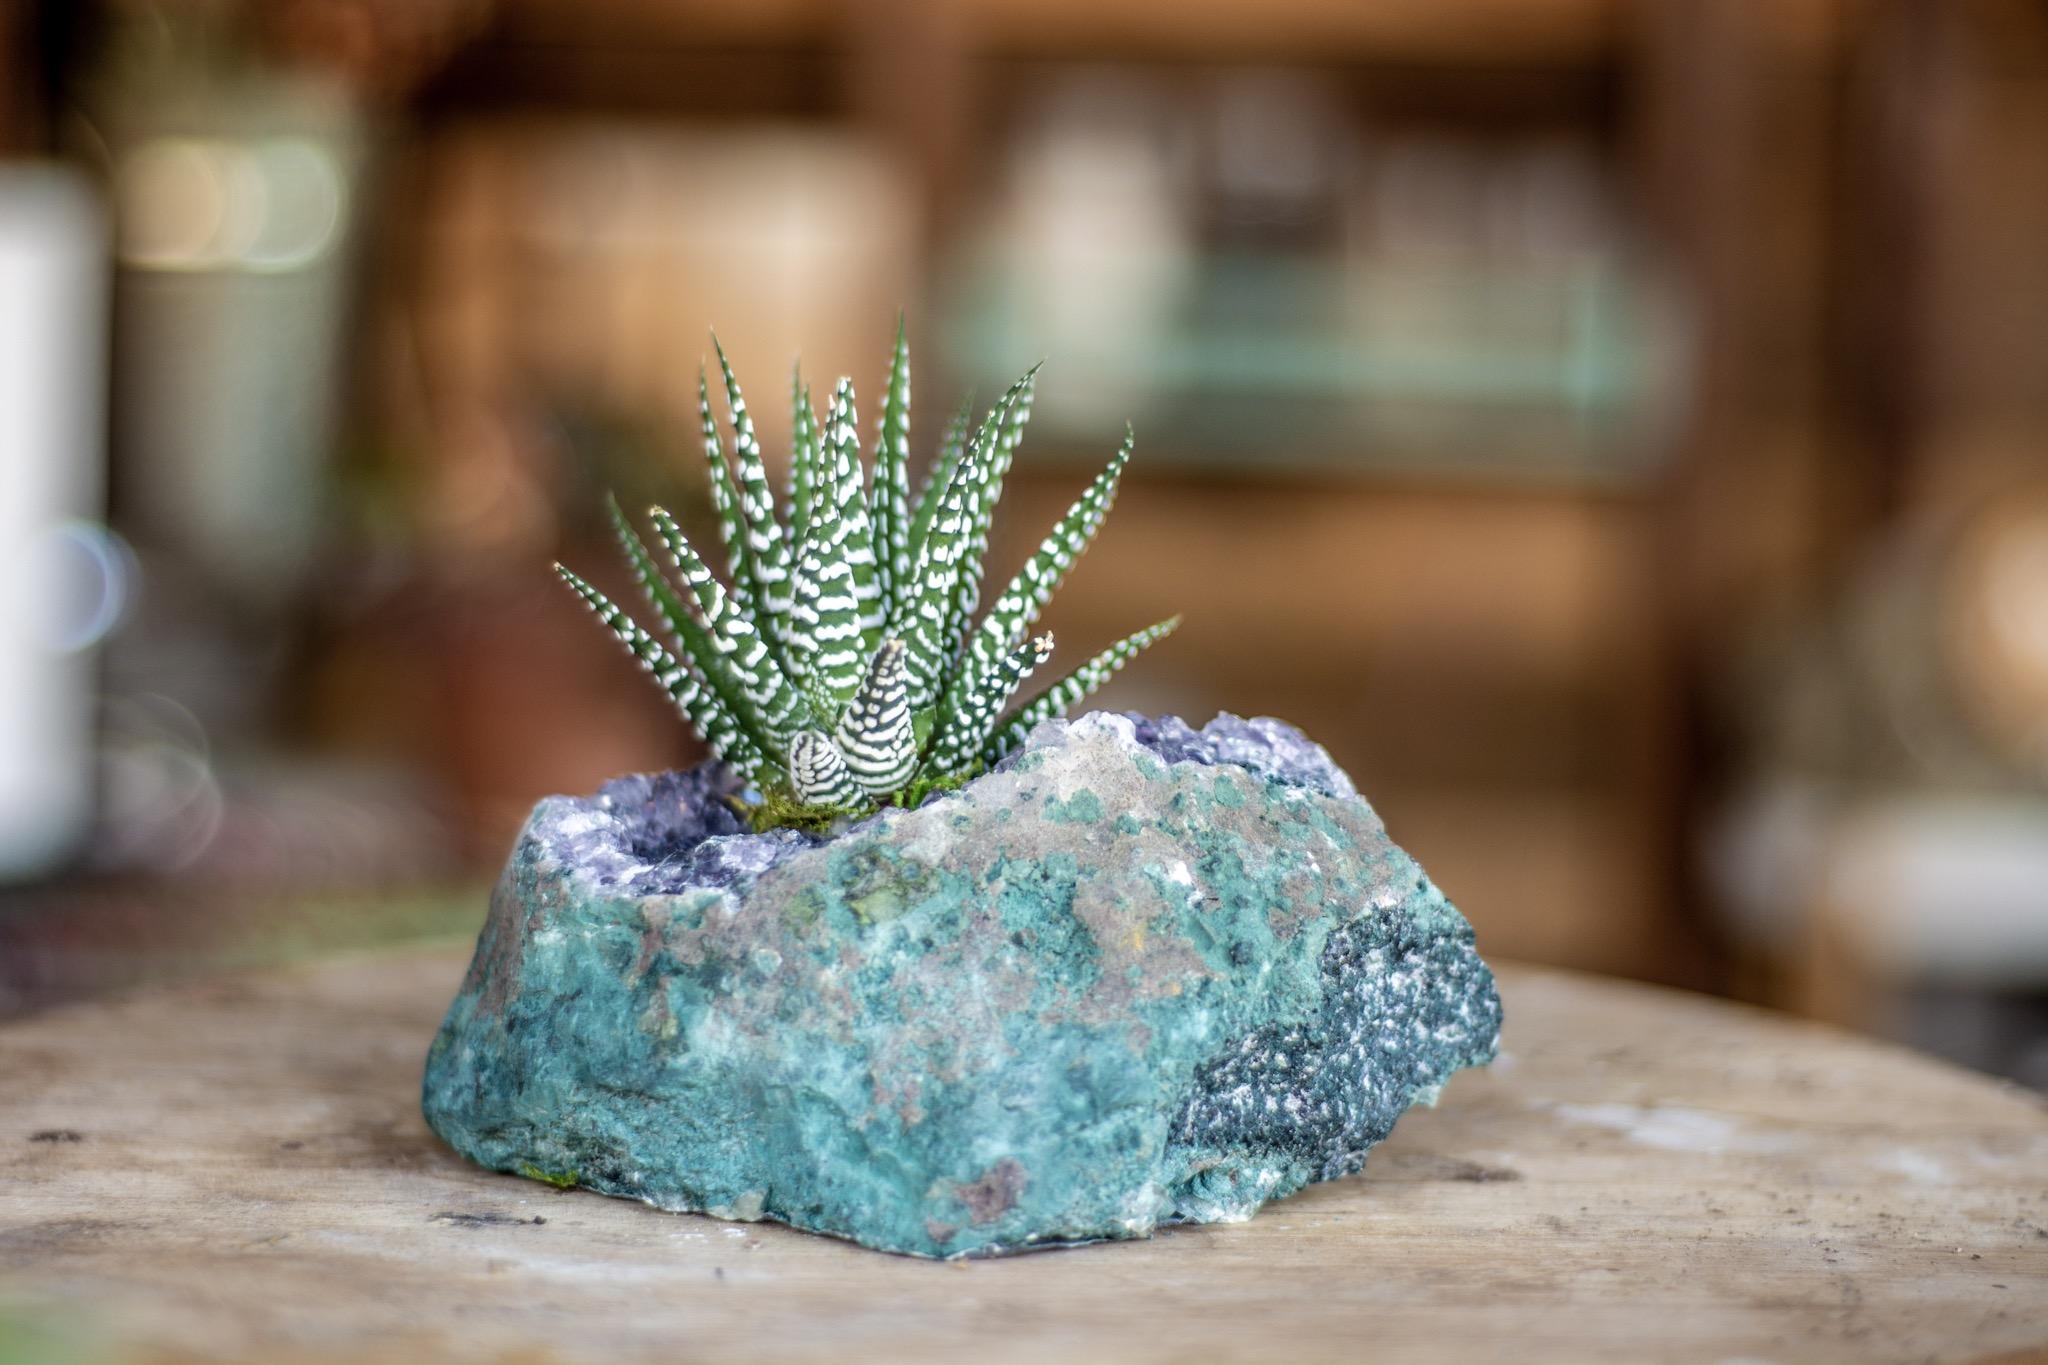 infinitesucculent_crystals_ccbiz_gabaccia__GAB5861.jpg